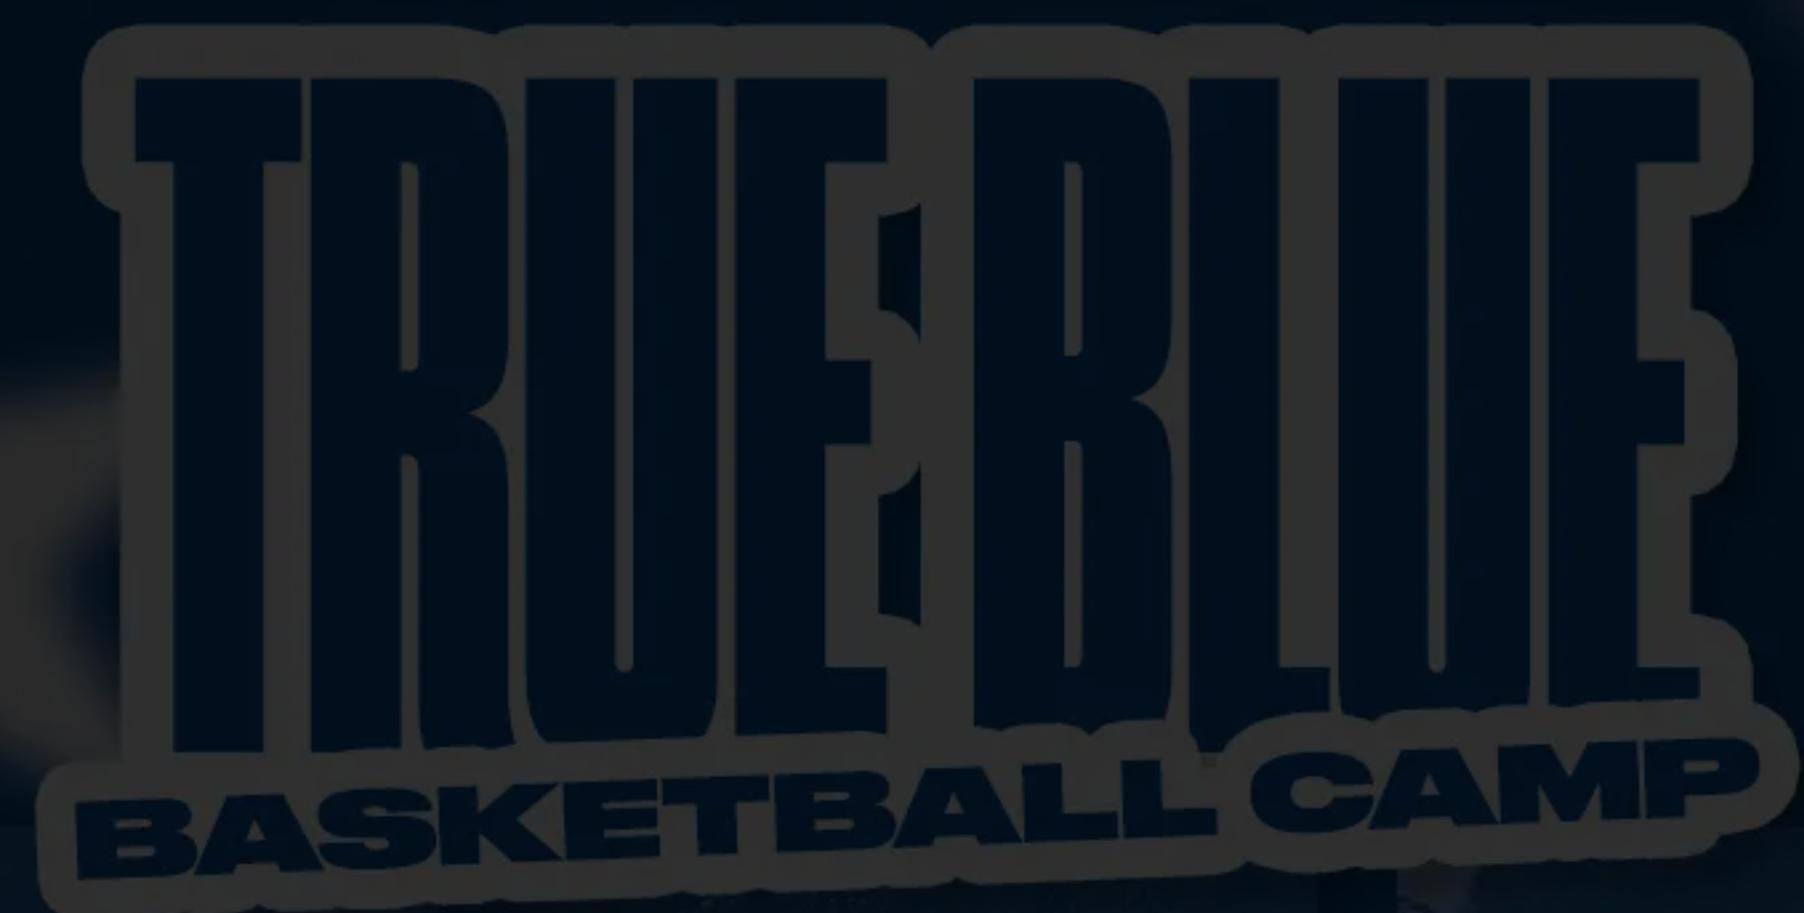 True Blue Basketball Camp Begins August 7th featuring Blue Devils: Wendell Moore, Trevor Keels & Jeremy Roach